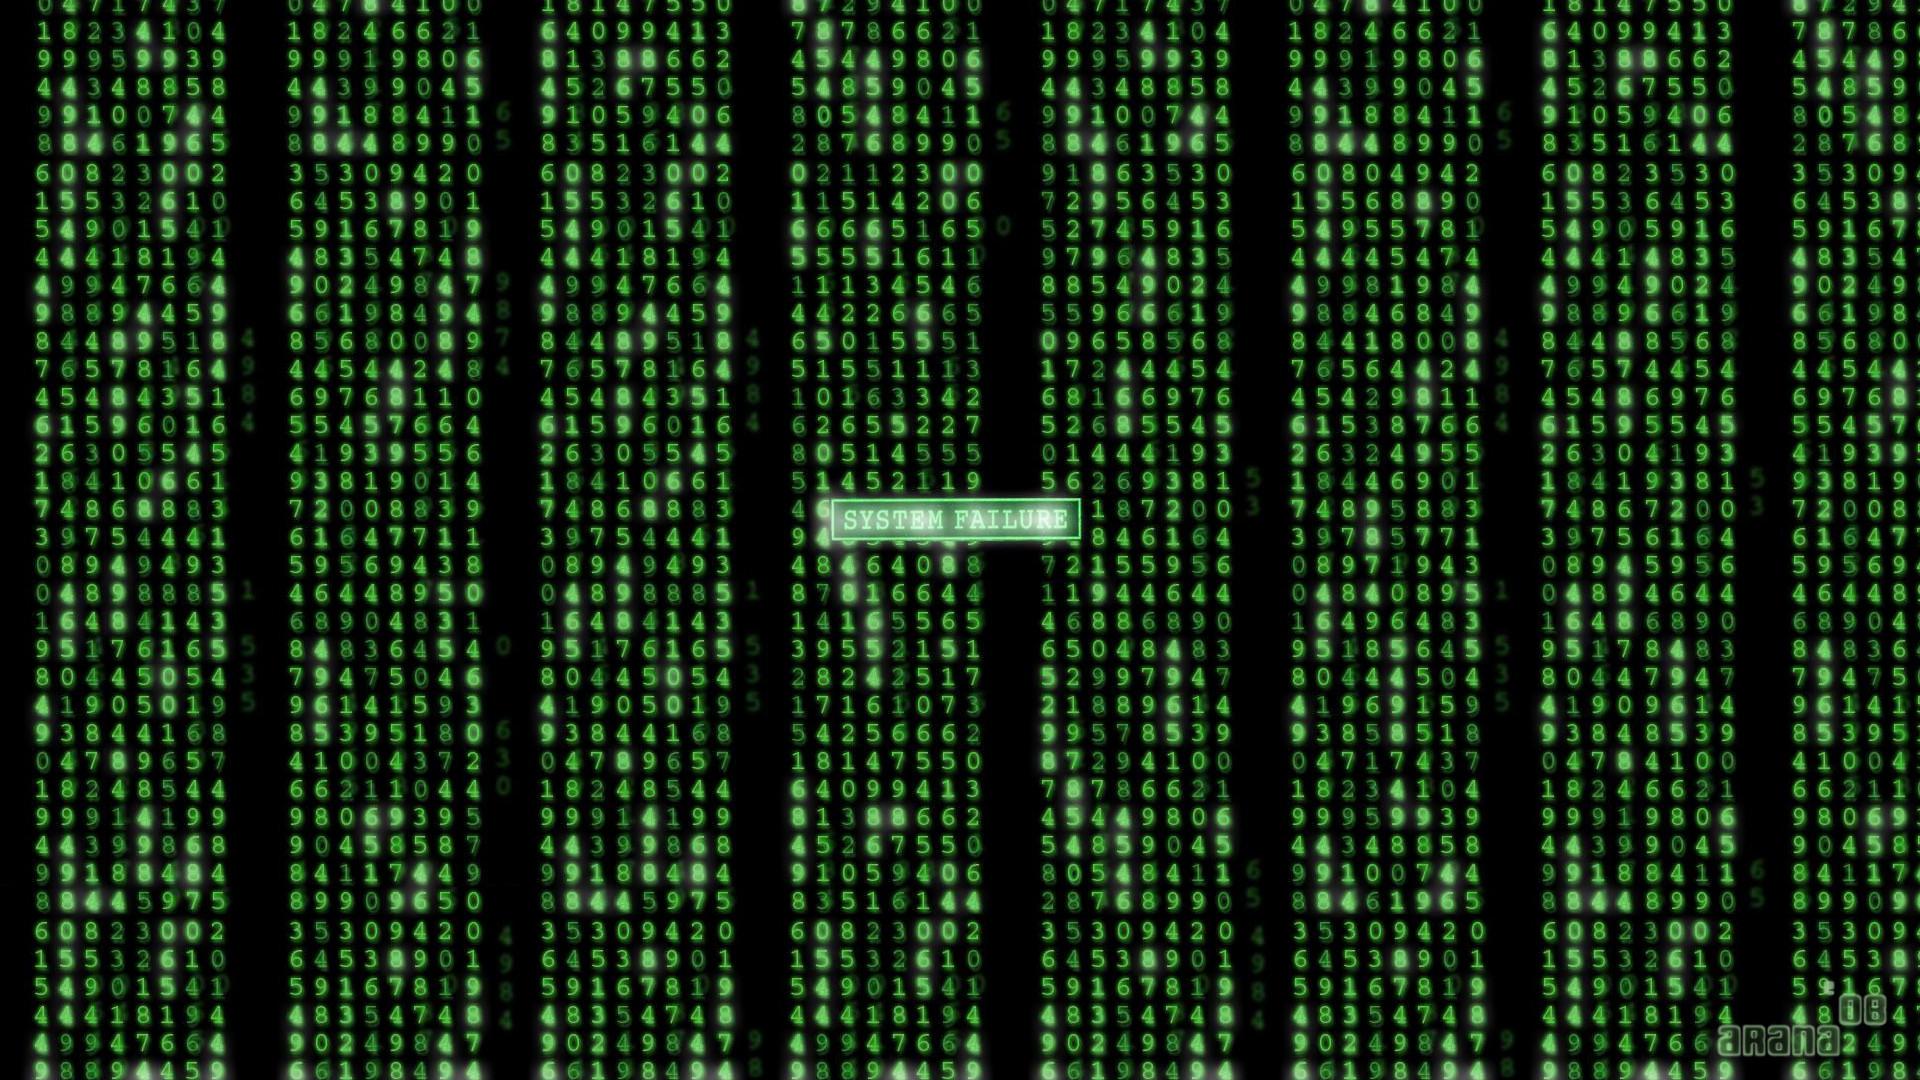 Matrix Gif Wallpapers (20 Wallpapers) – Adorable Wallpapers